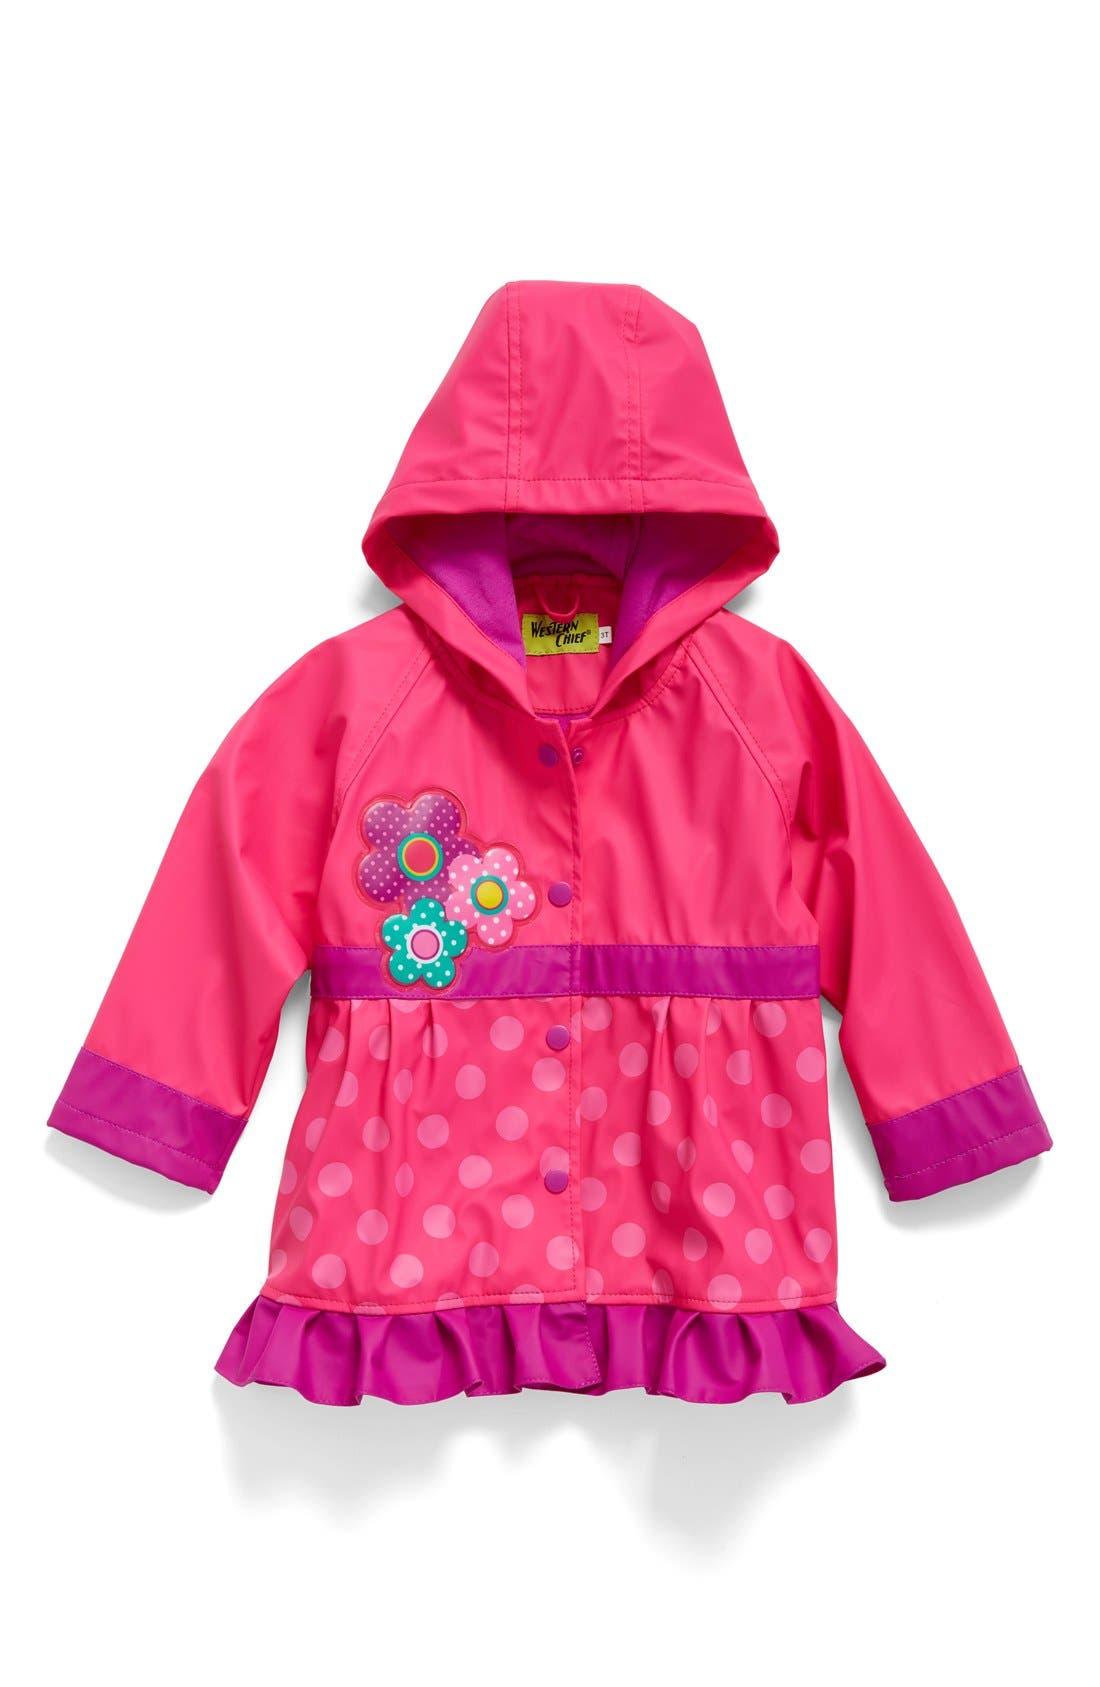 Alternate Image 1 Selected - Western Chief Flower Cutie Raincoat (Toddler Girls & Little Girls)